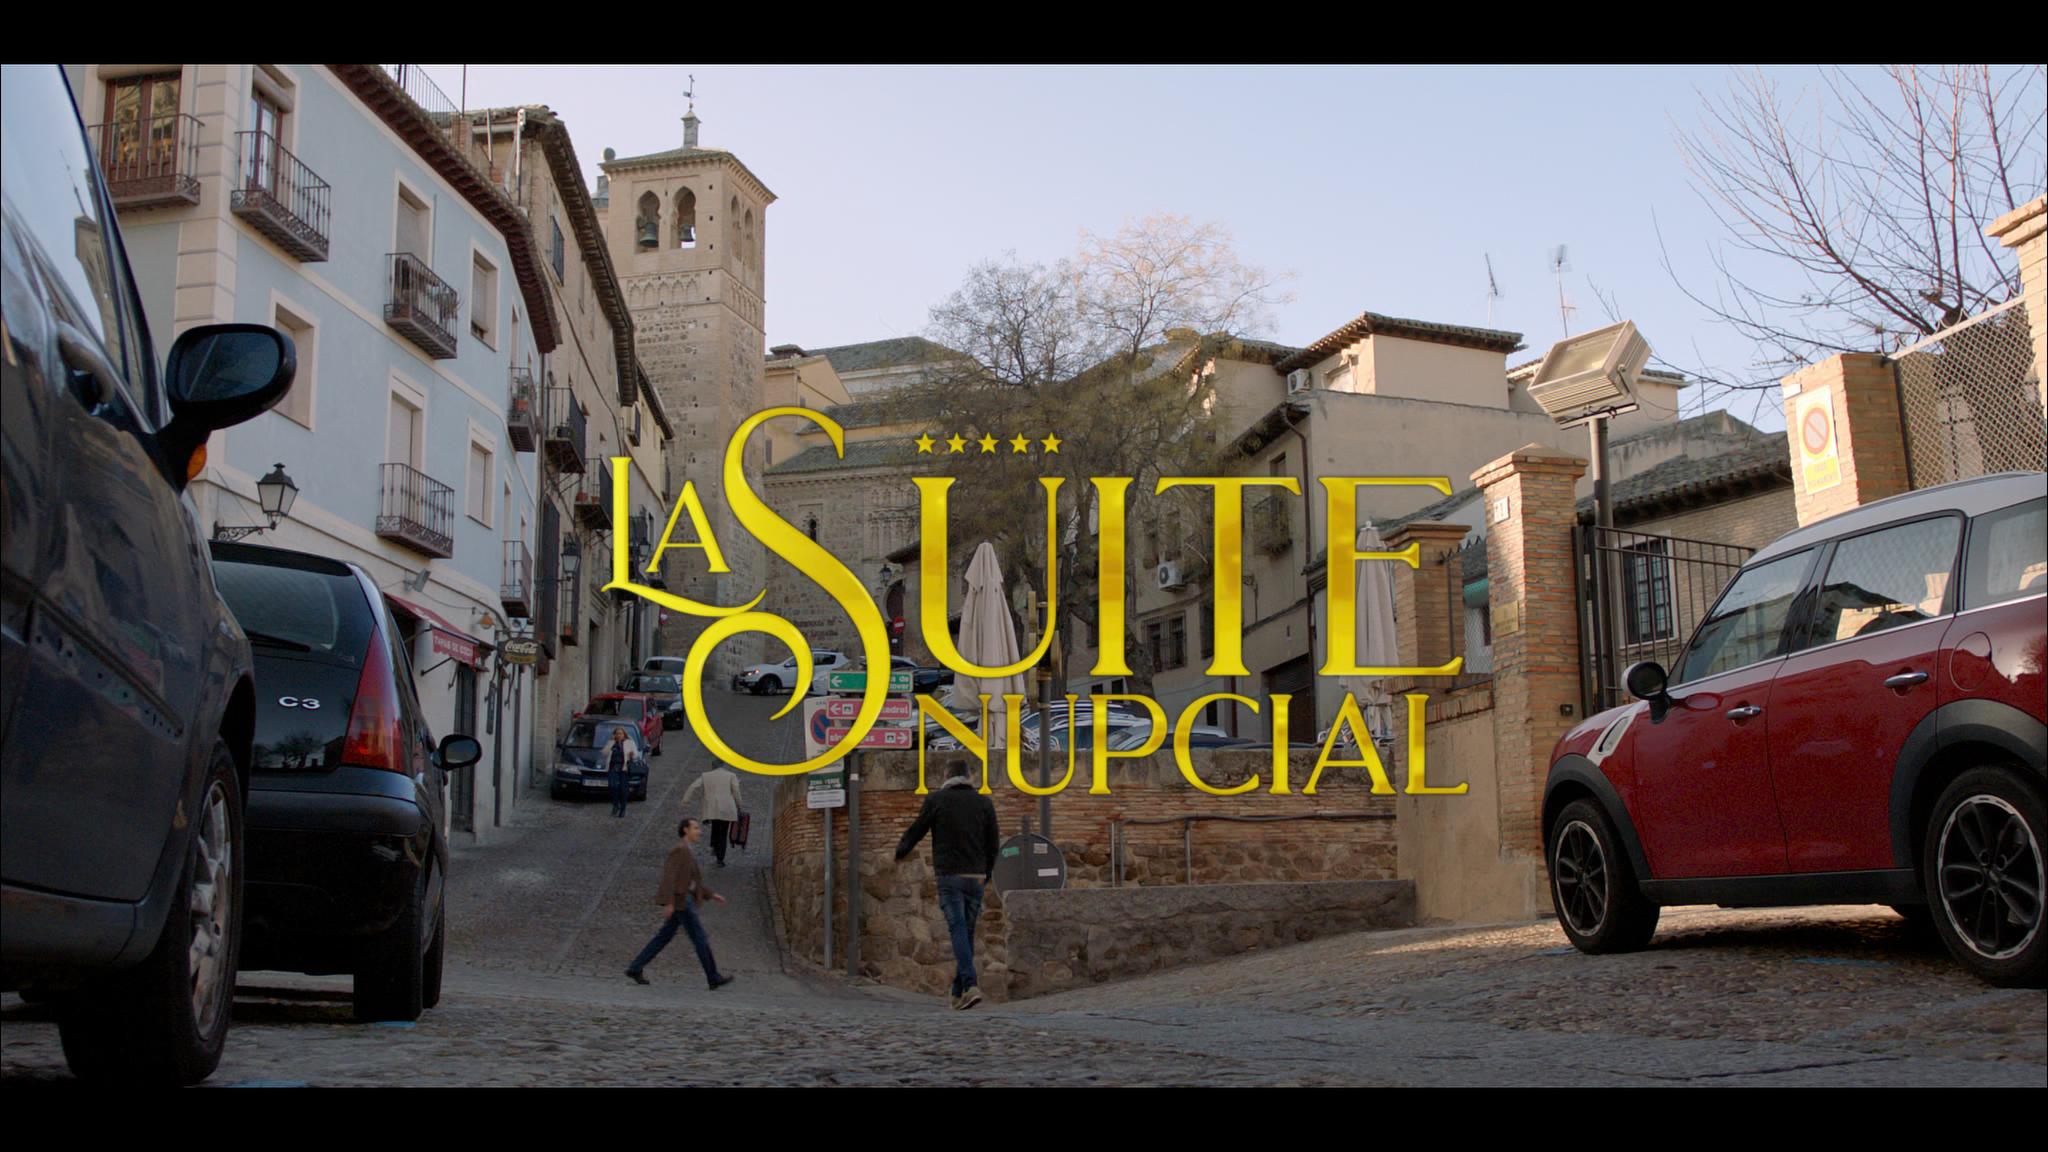 SUITE_NUPCIAL_WEB_04_007030